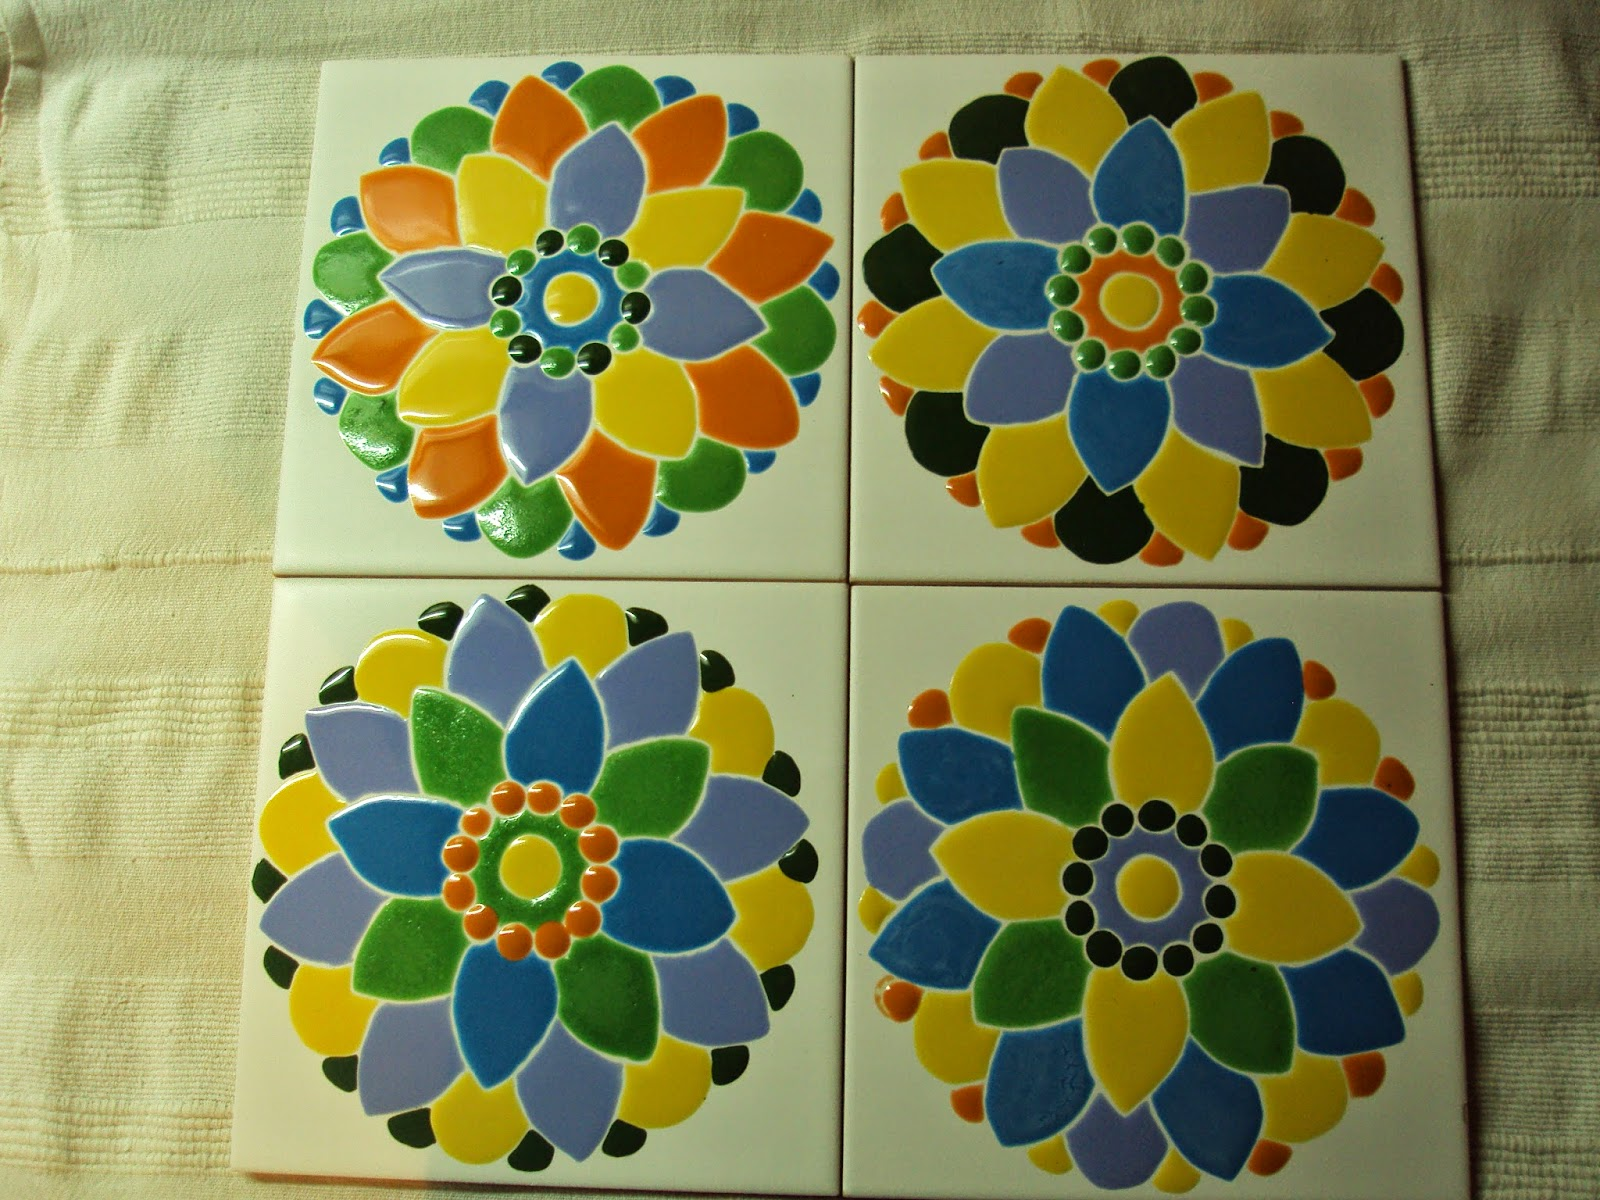 Betuart azulejos artesanales estilo mexico for Azulejos artesanales